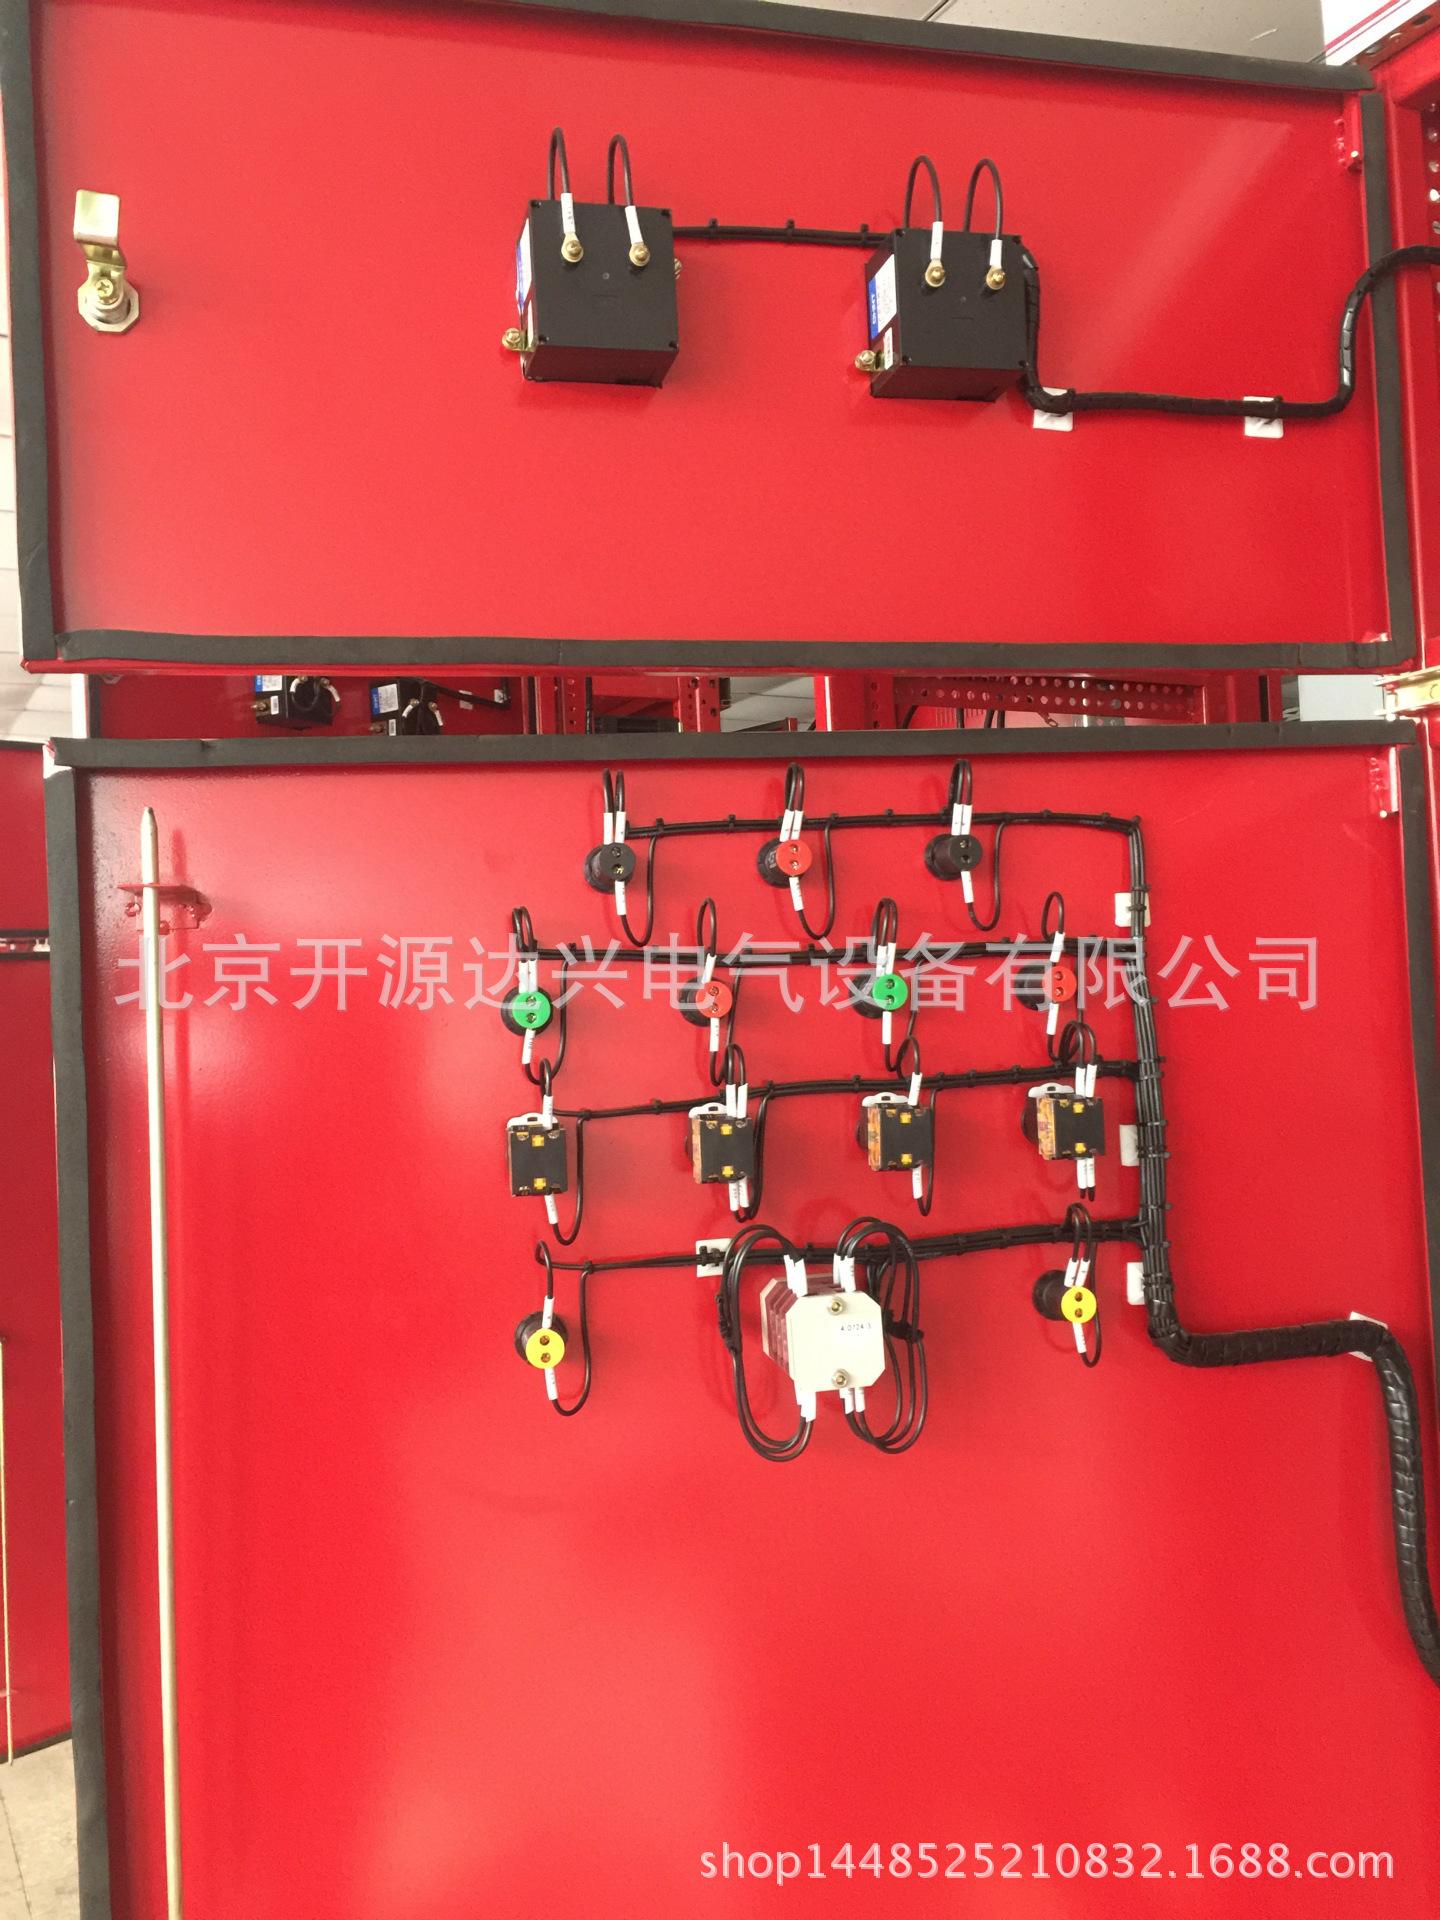 Direct fire control box, fire pump control box, fire inspection control box, fire sprinkler control